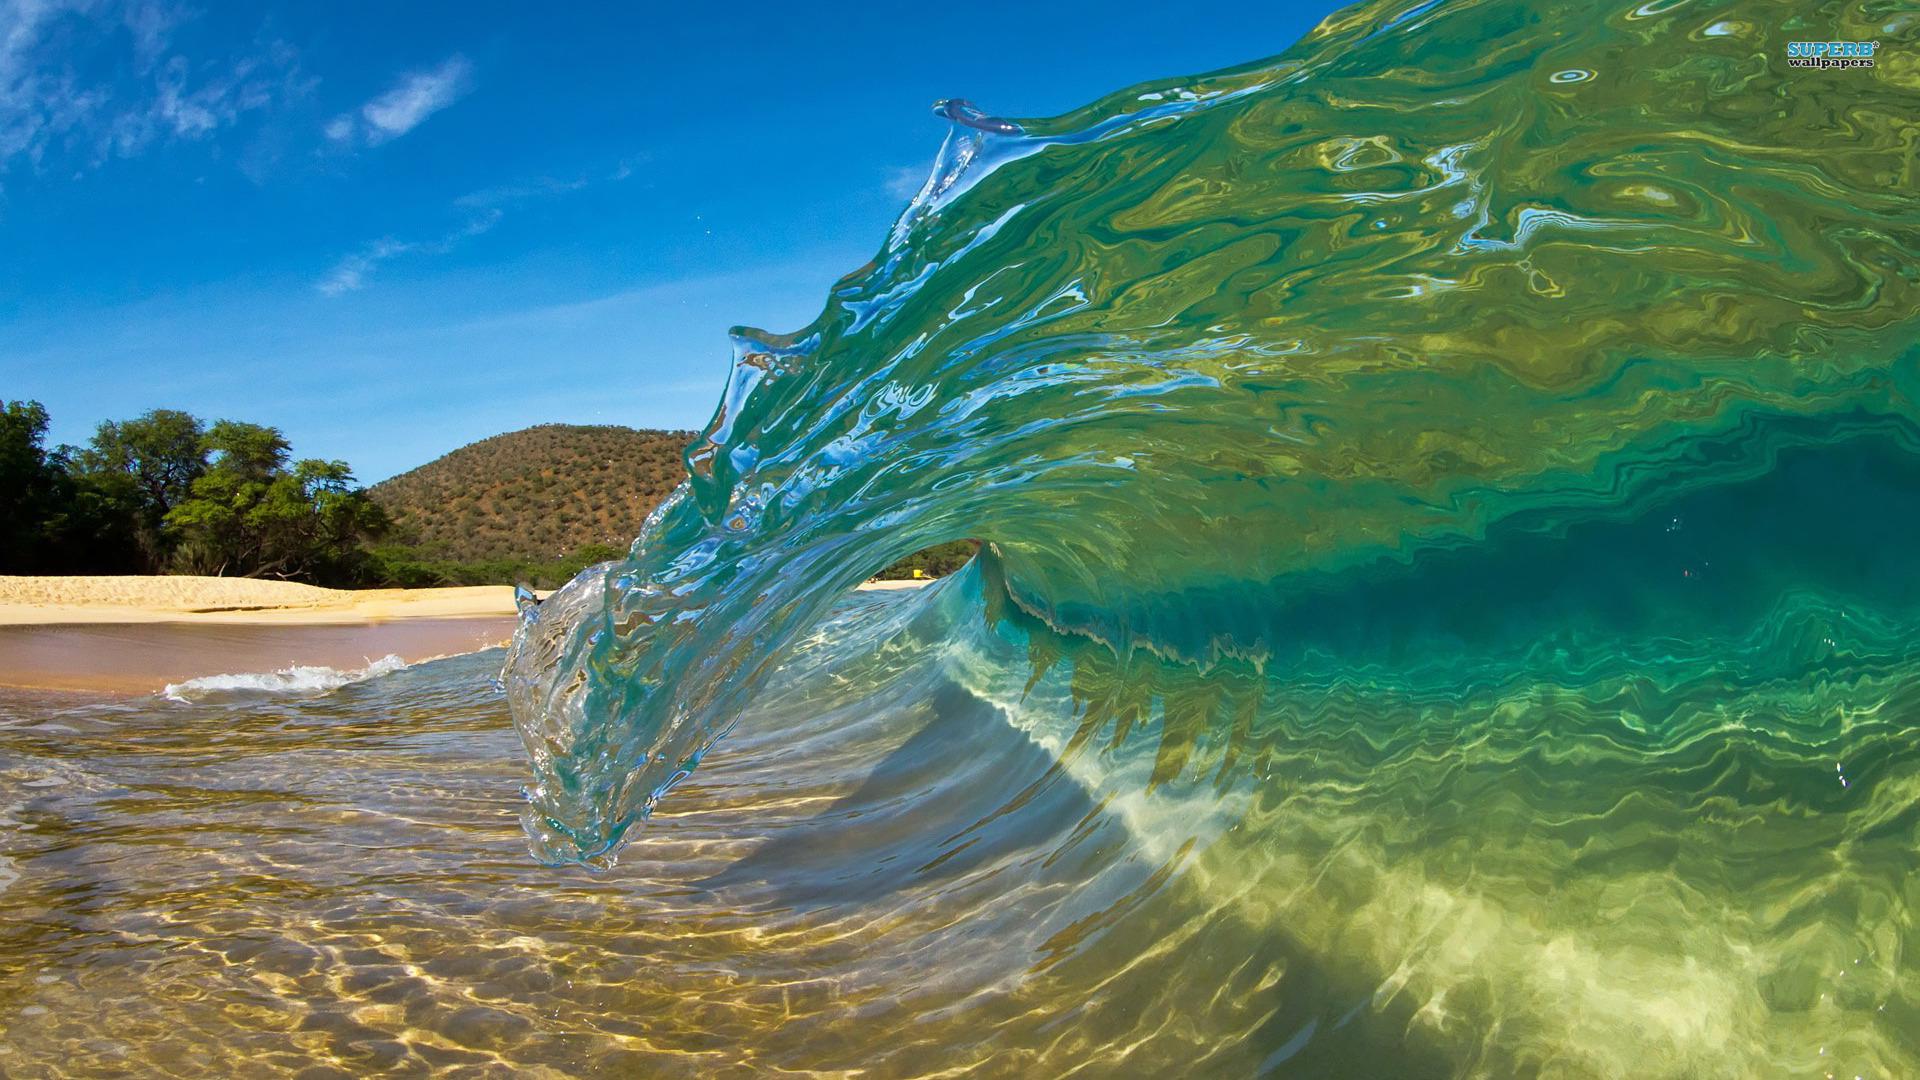 Wave Wallpaper High Resolution wave images - H...